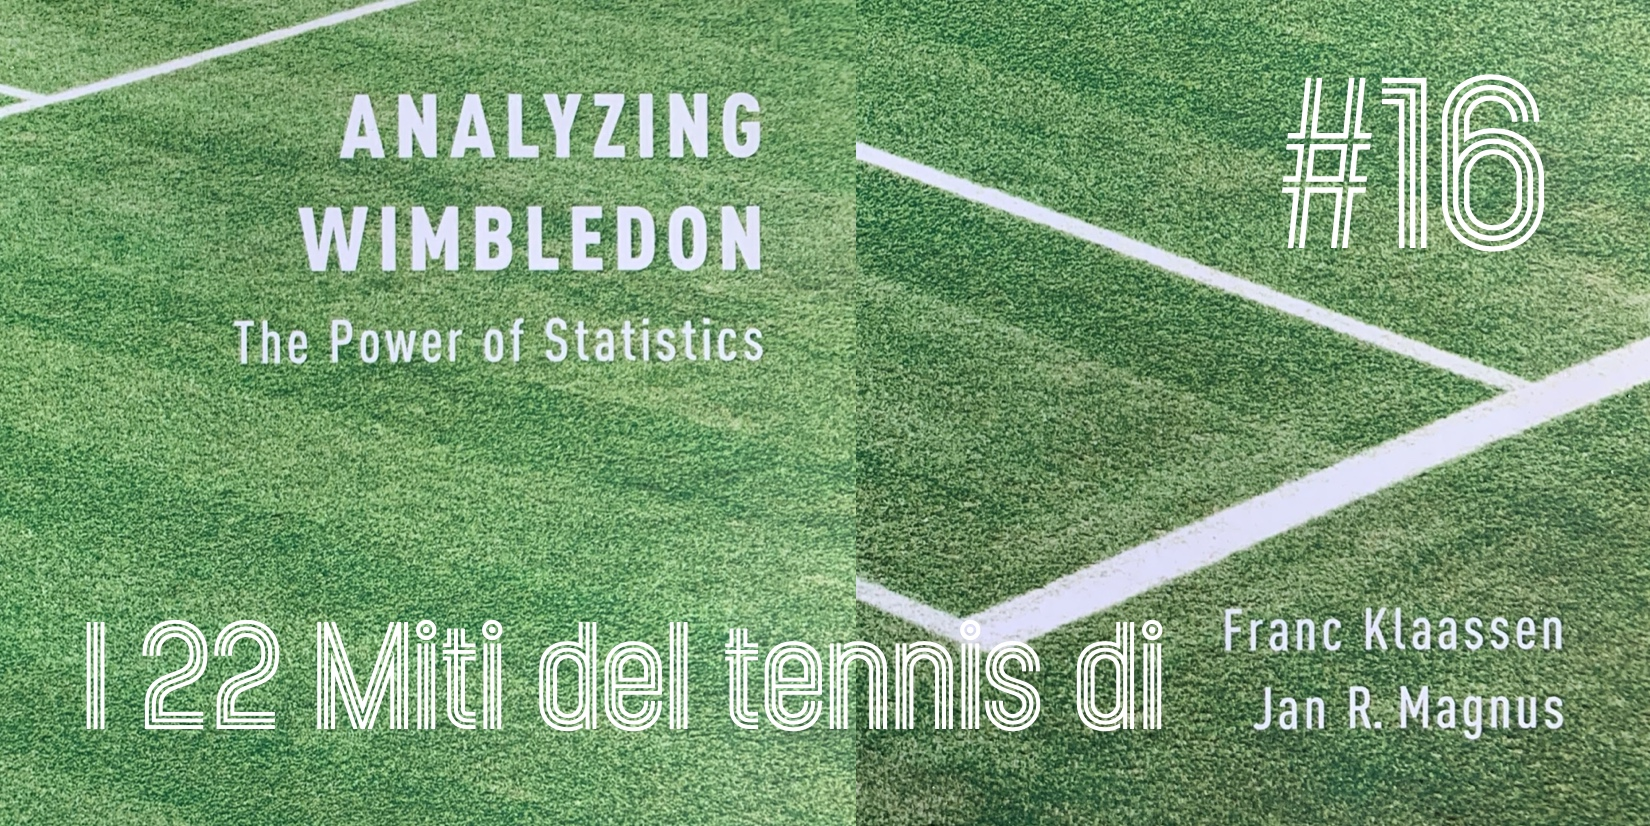 I 22 miti del tennis di Klaassen & Magnus – Mito 16 - settesei.it